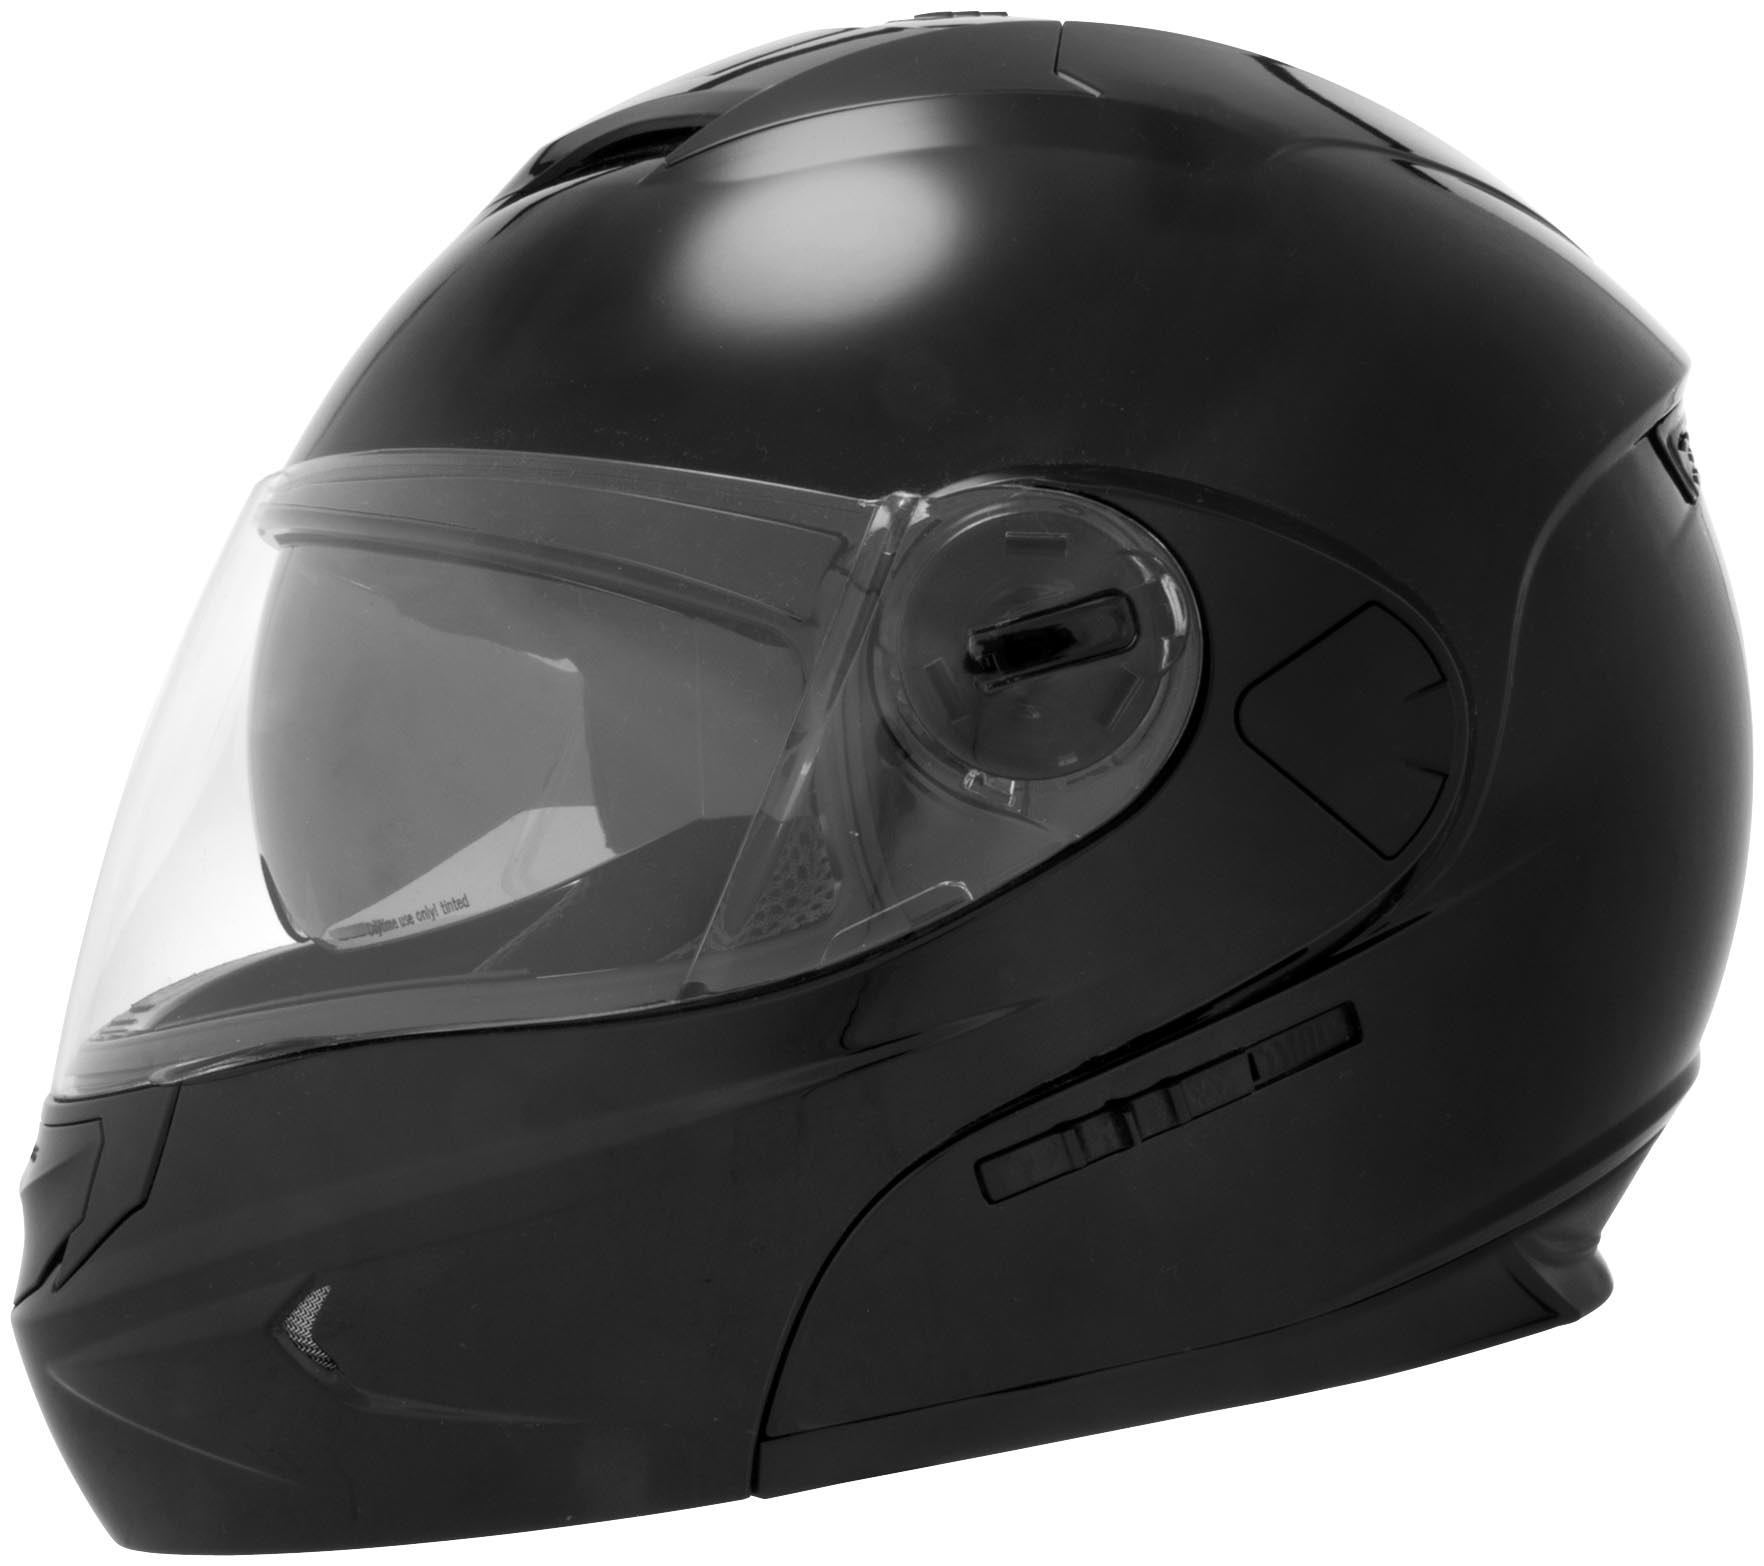 U-217 Modular Solid Helmet